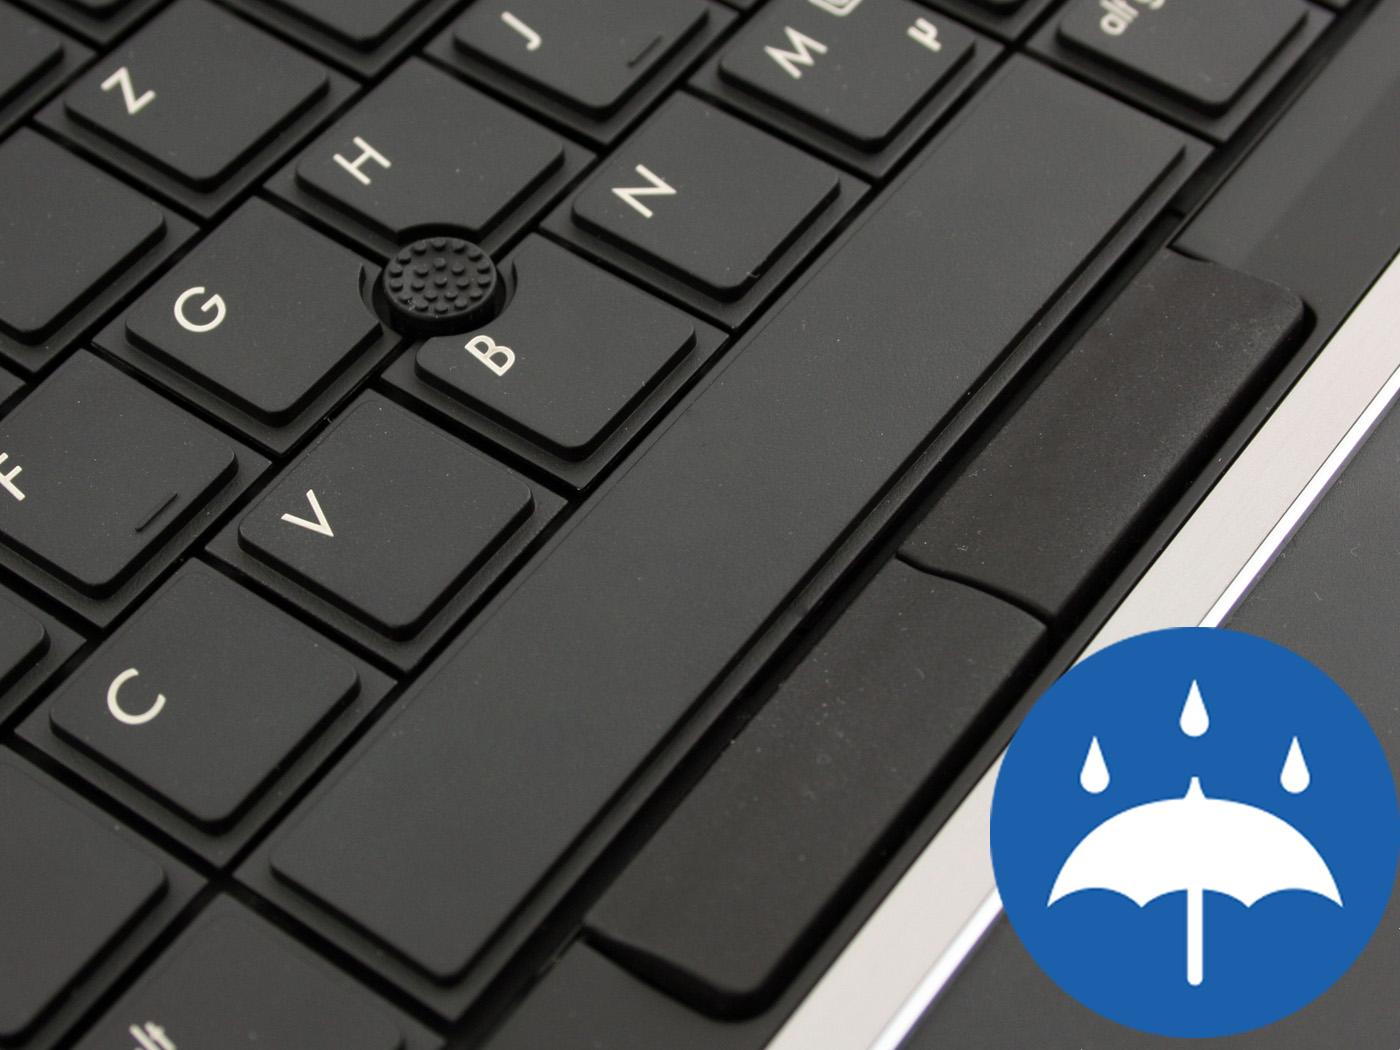 spill free keyboard